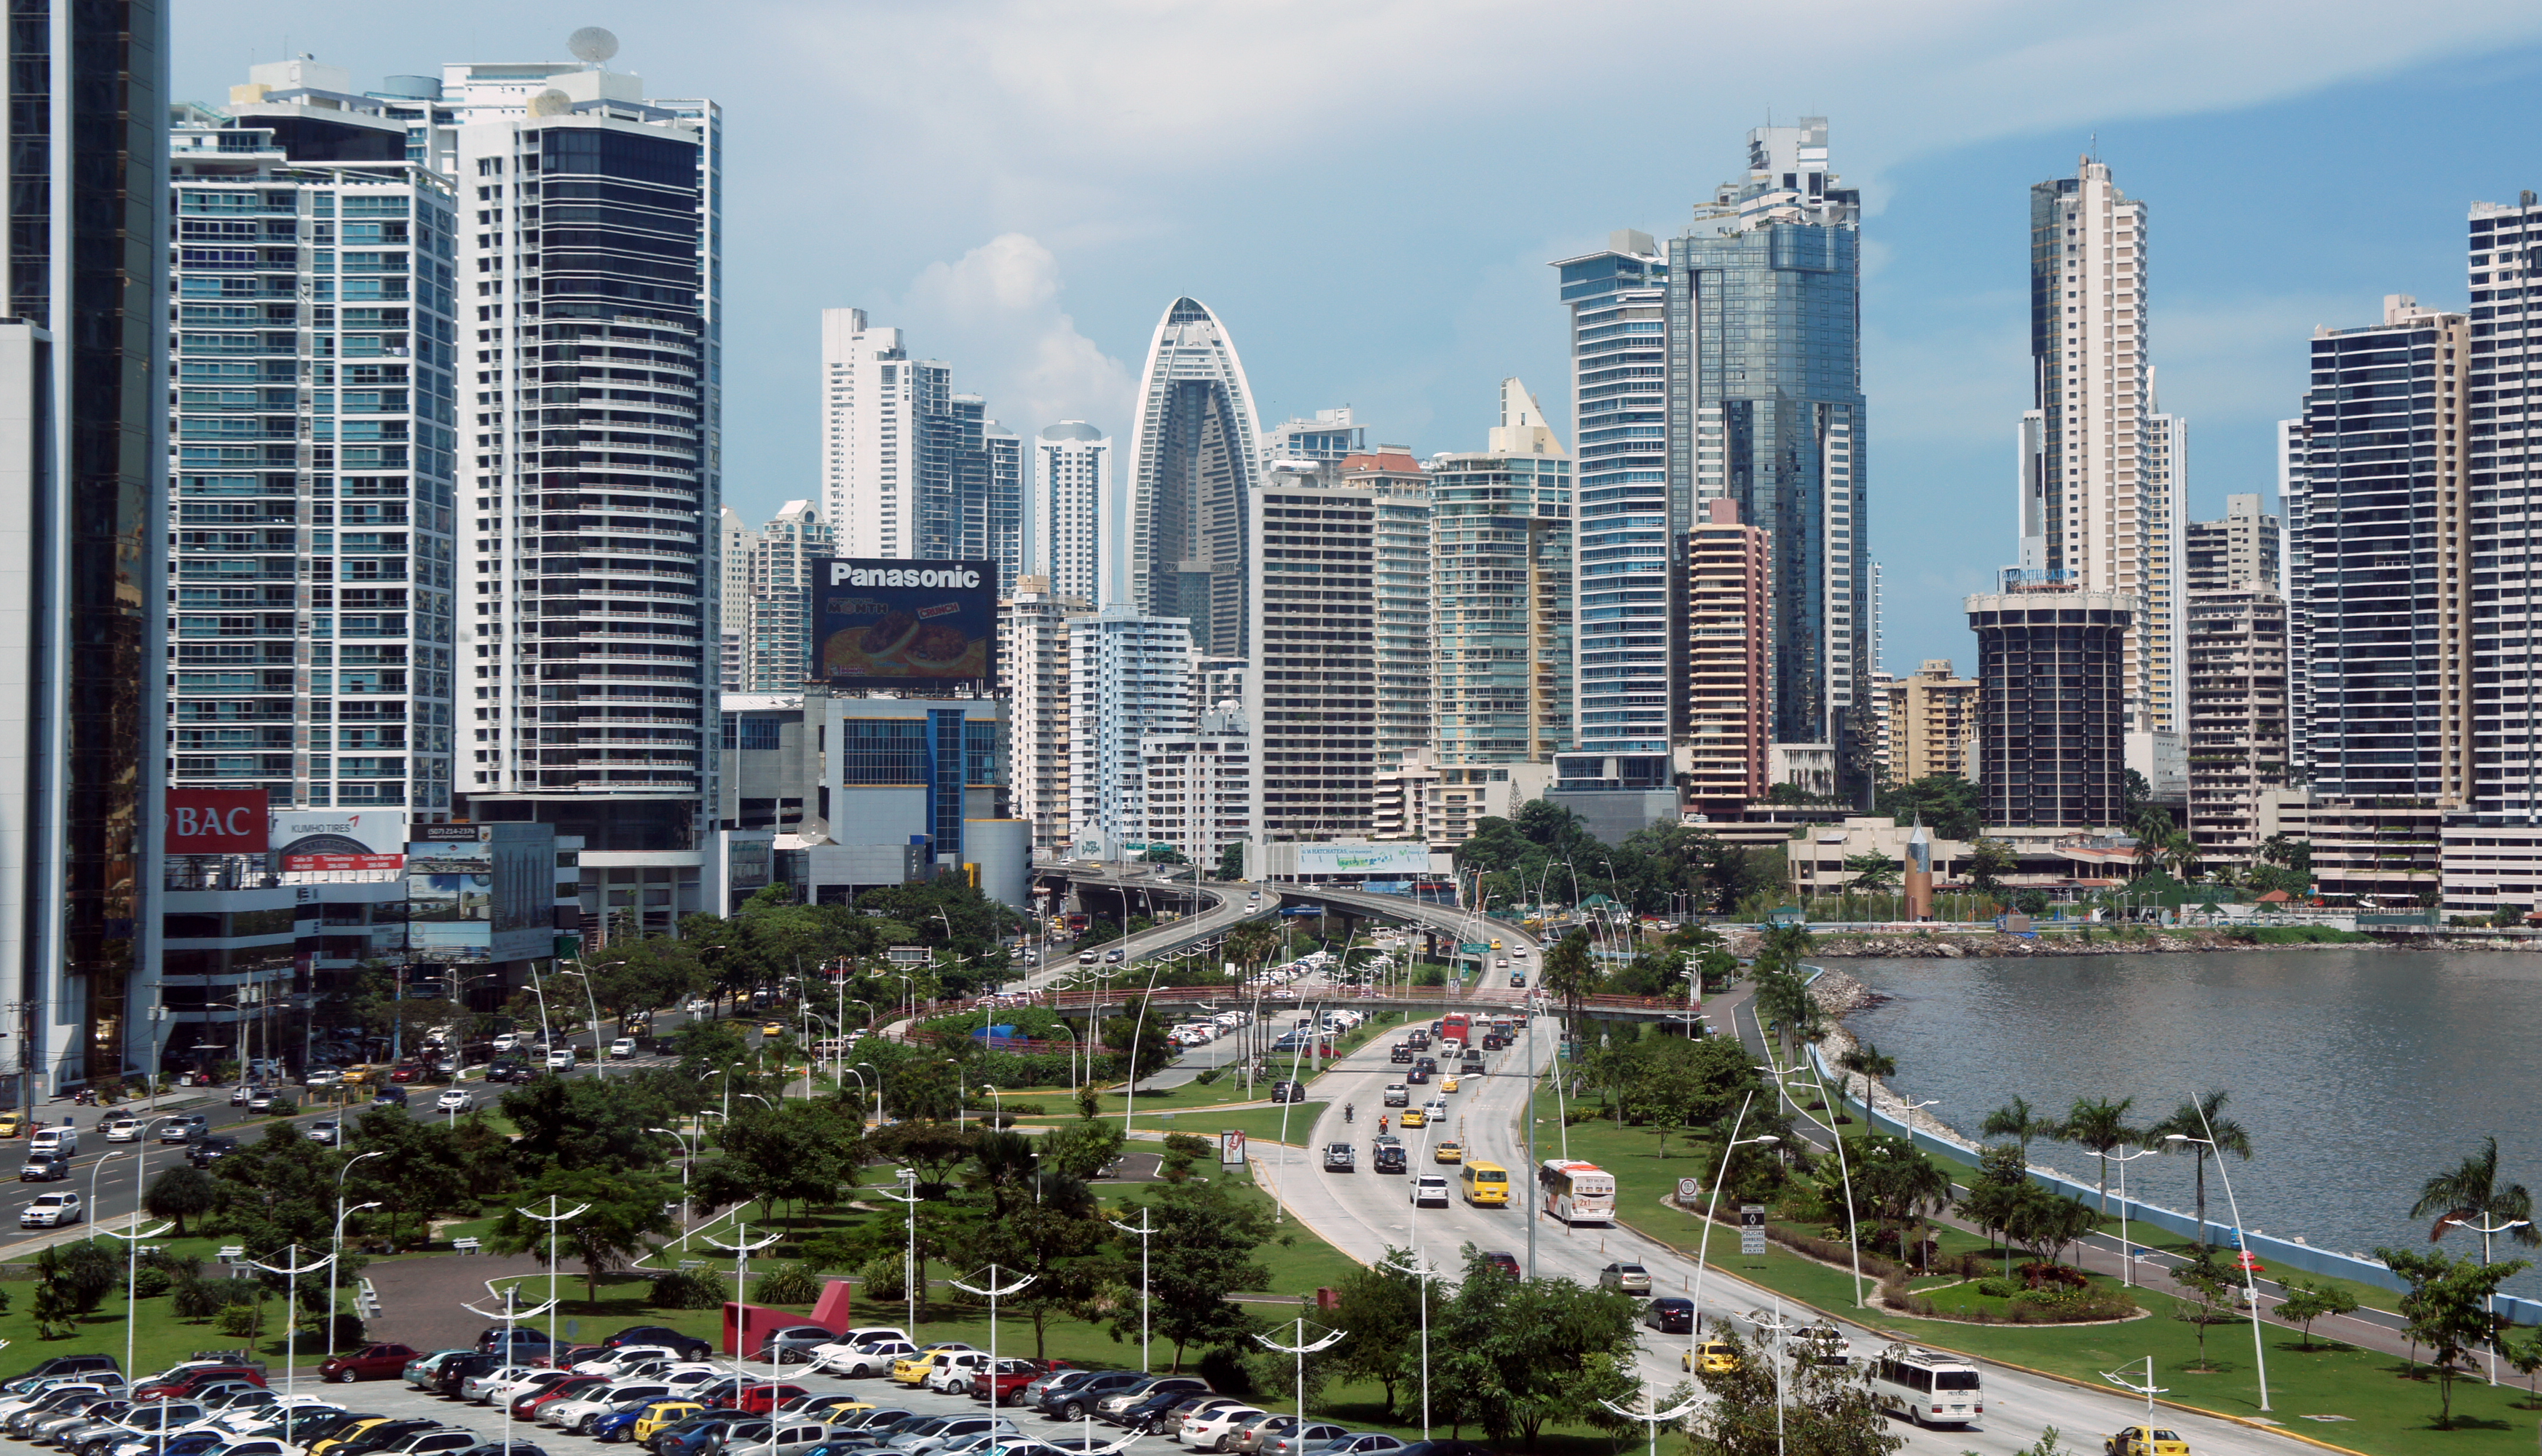 Avenida Balboa à Panama City